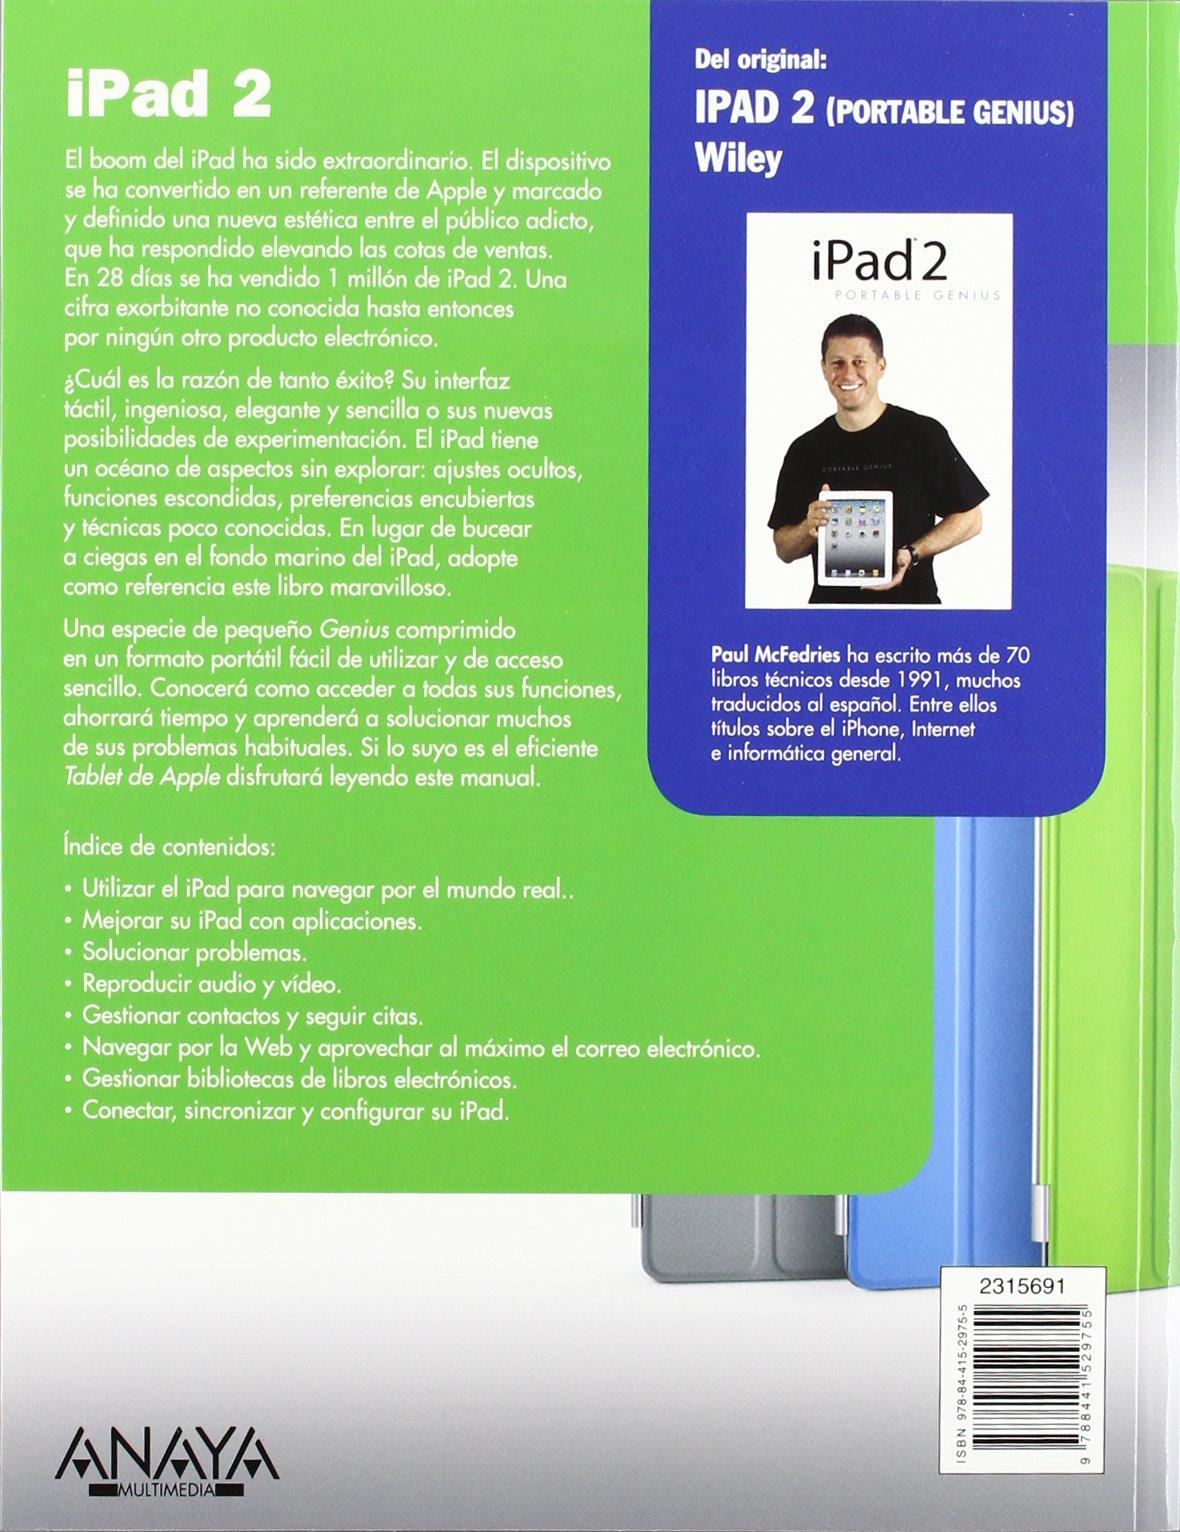 iPad 2 / iPad 2 Portable Genius (Spanish Edition): Paul McFedries, Ana  Belen Rubio Orraca: 9788441529755: Amazon.com: Books